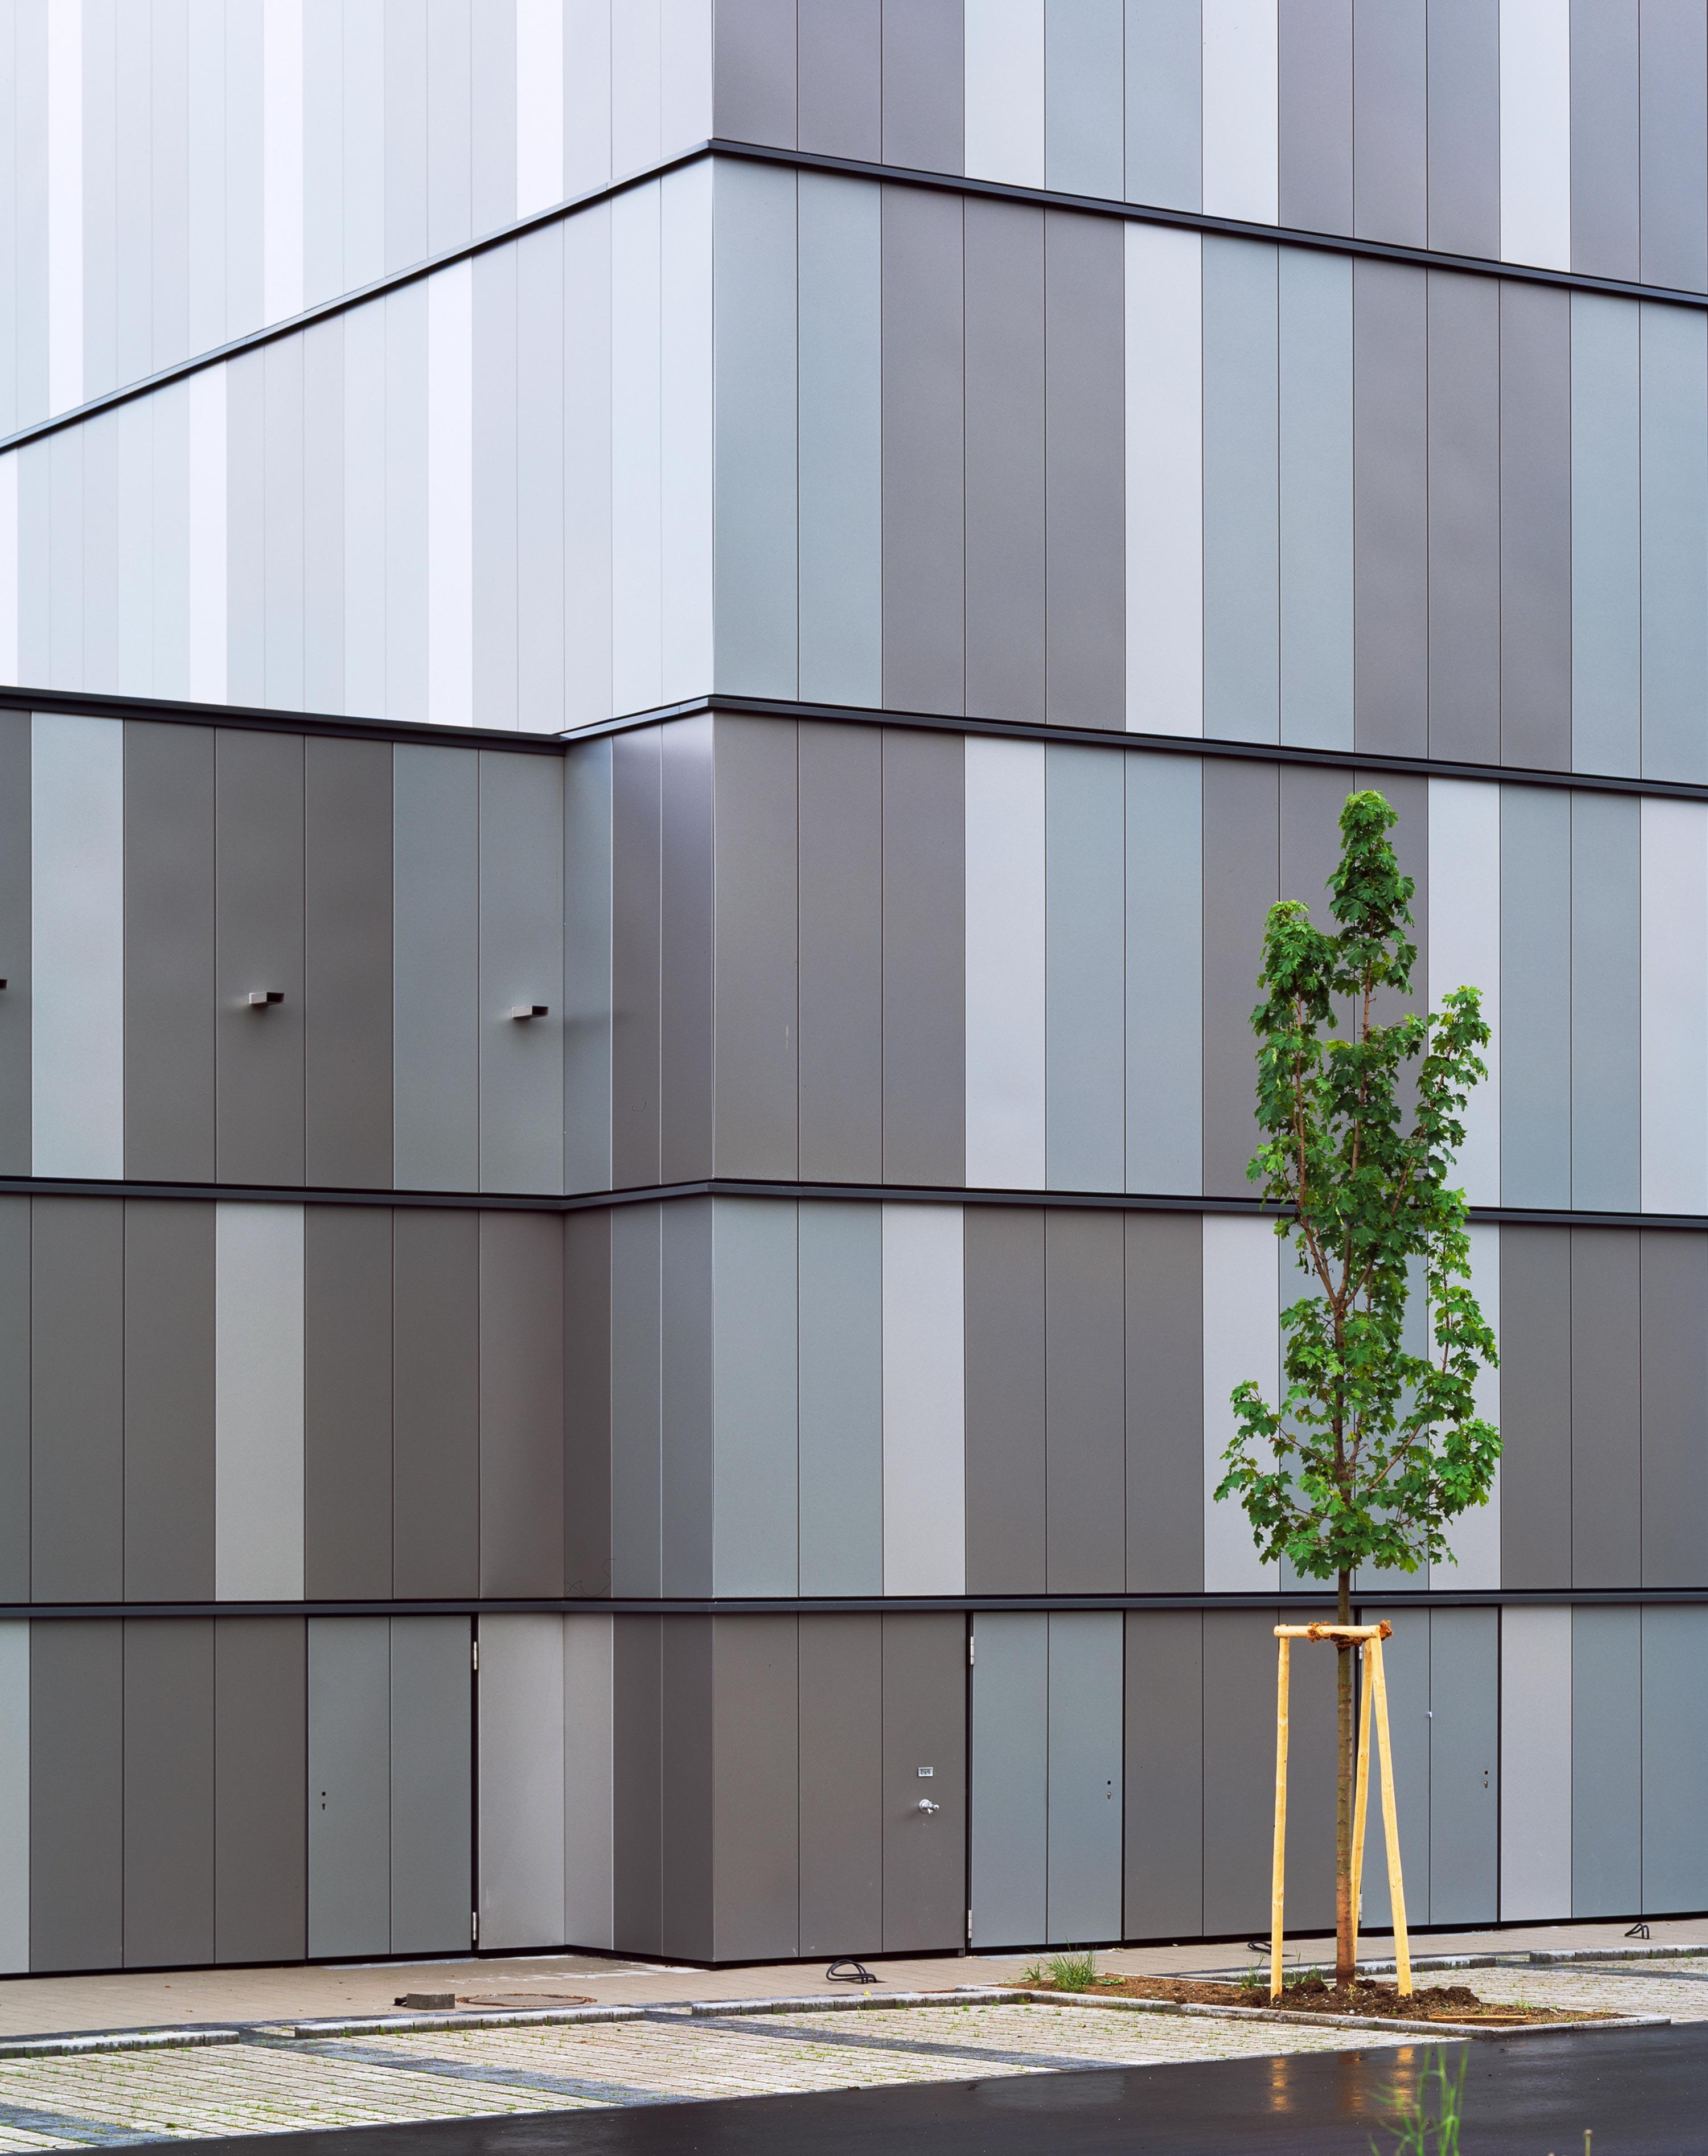 Neubau Logistikzentrum mit Großraumbüro (14)